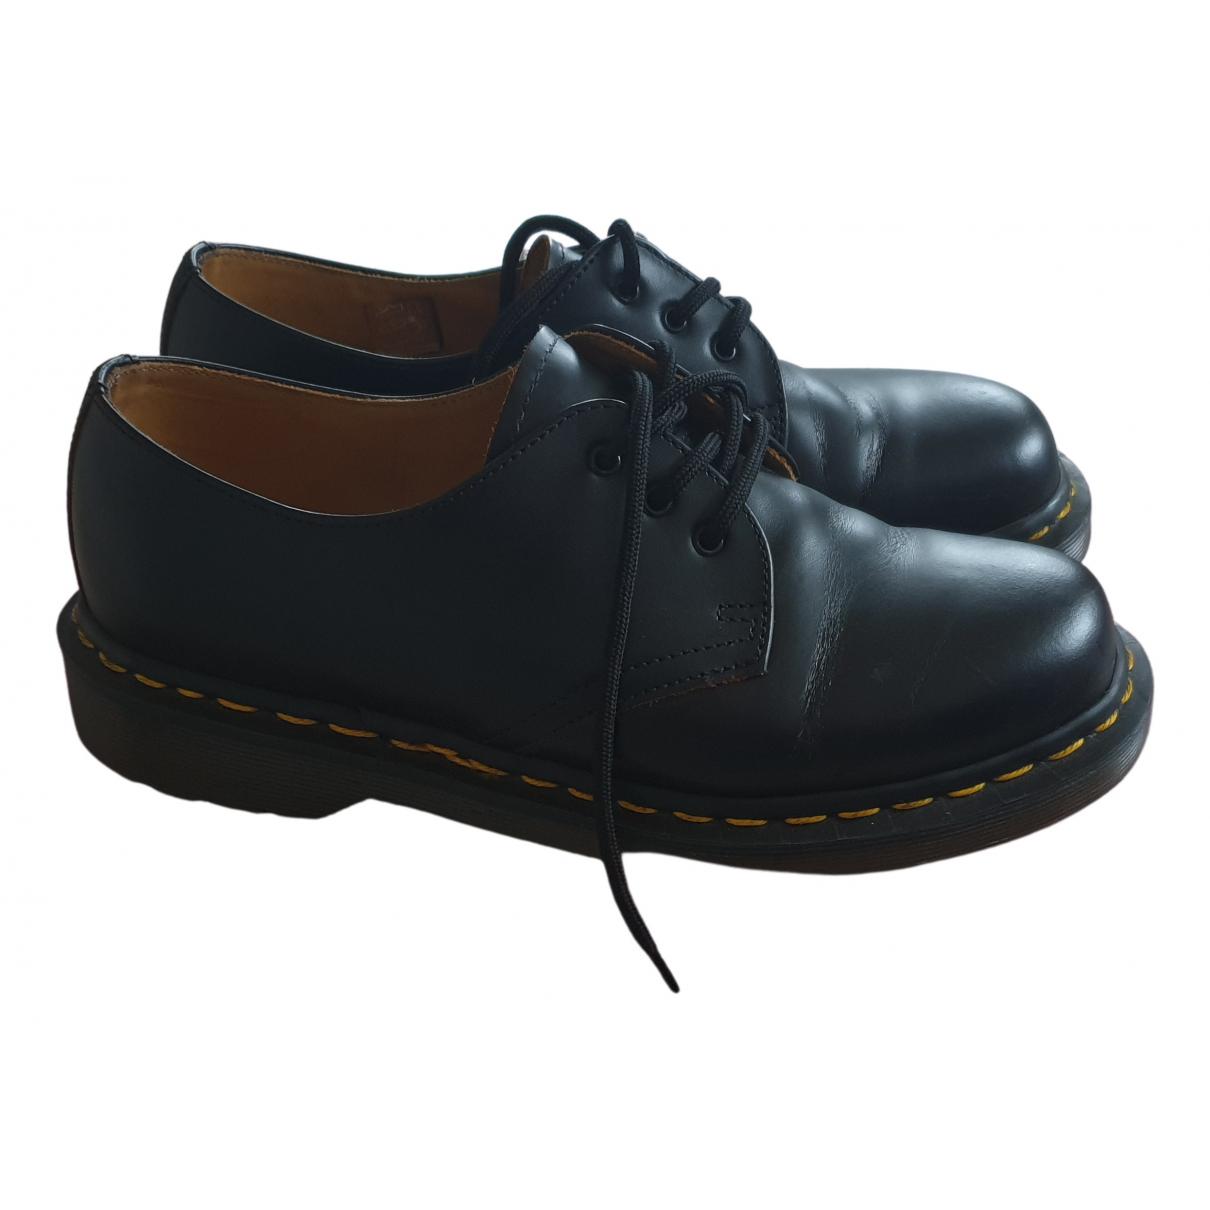 Dr. Martens 1461 (3 eye) Black Leather Lace ups for Women 5 UK